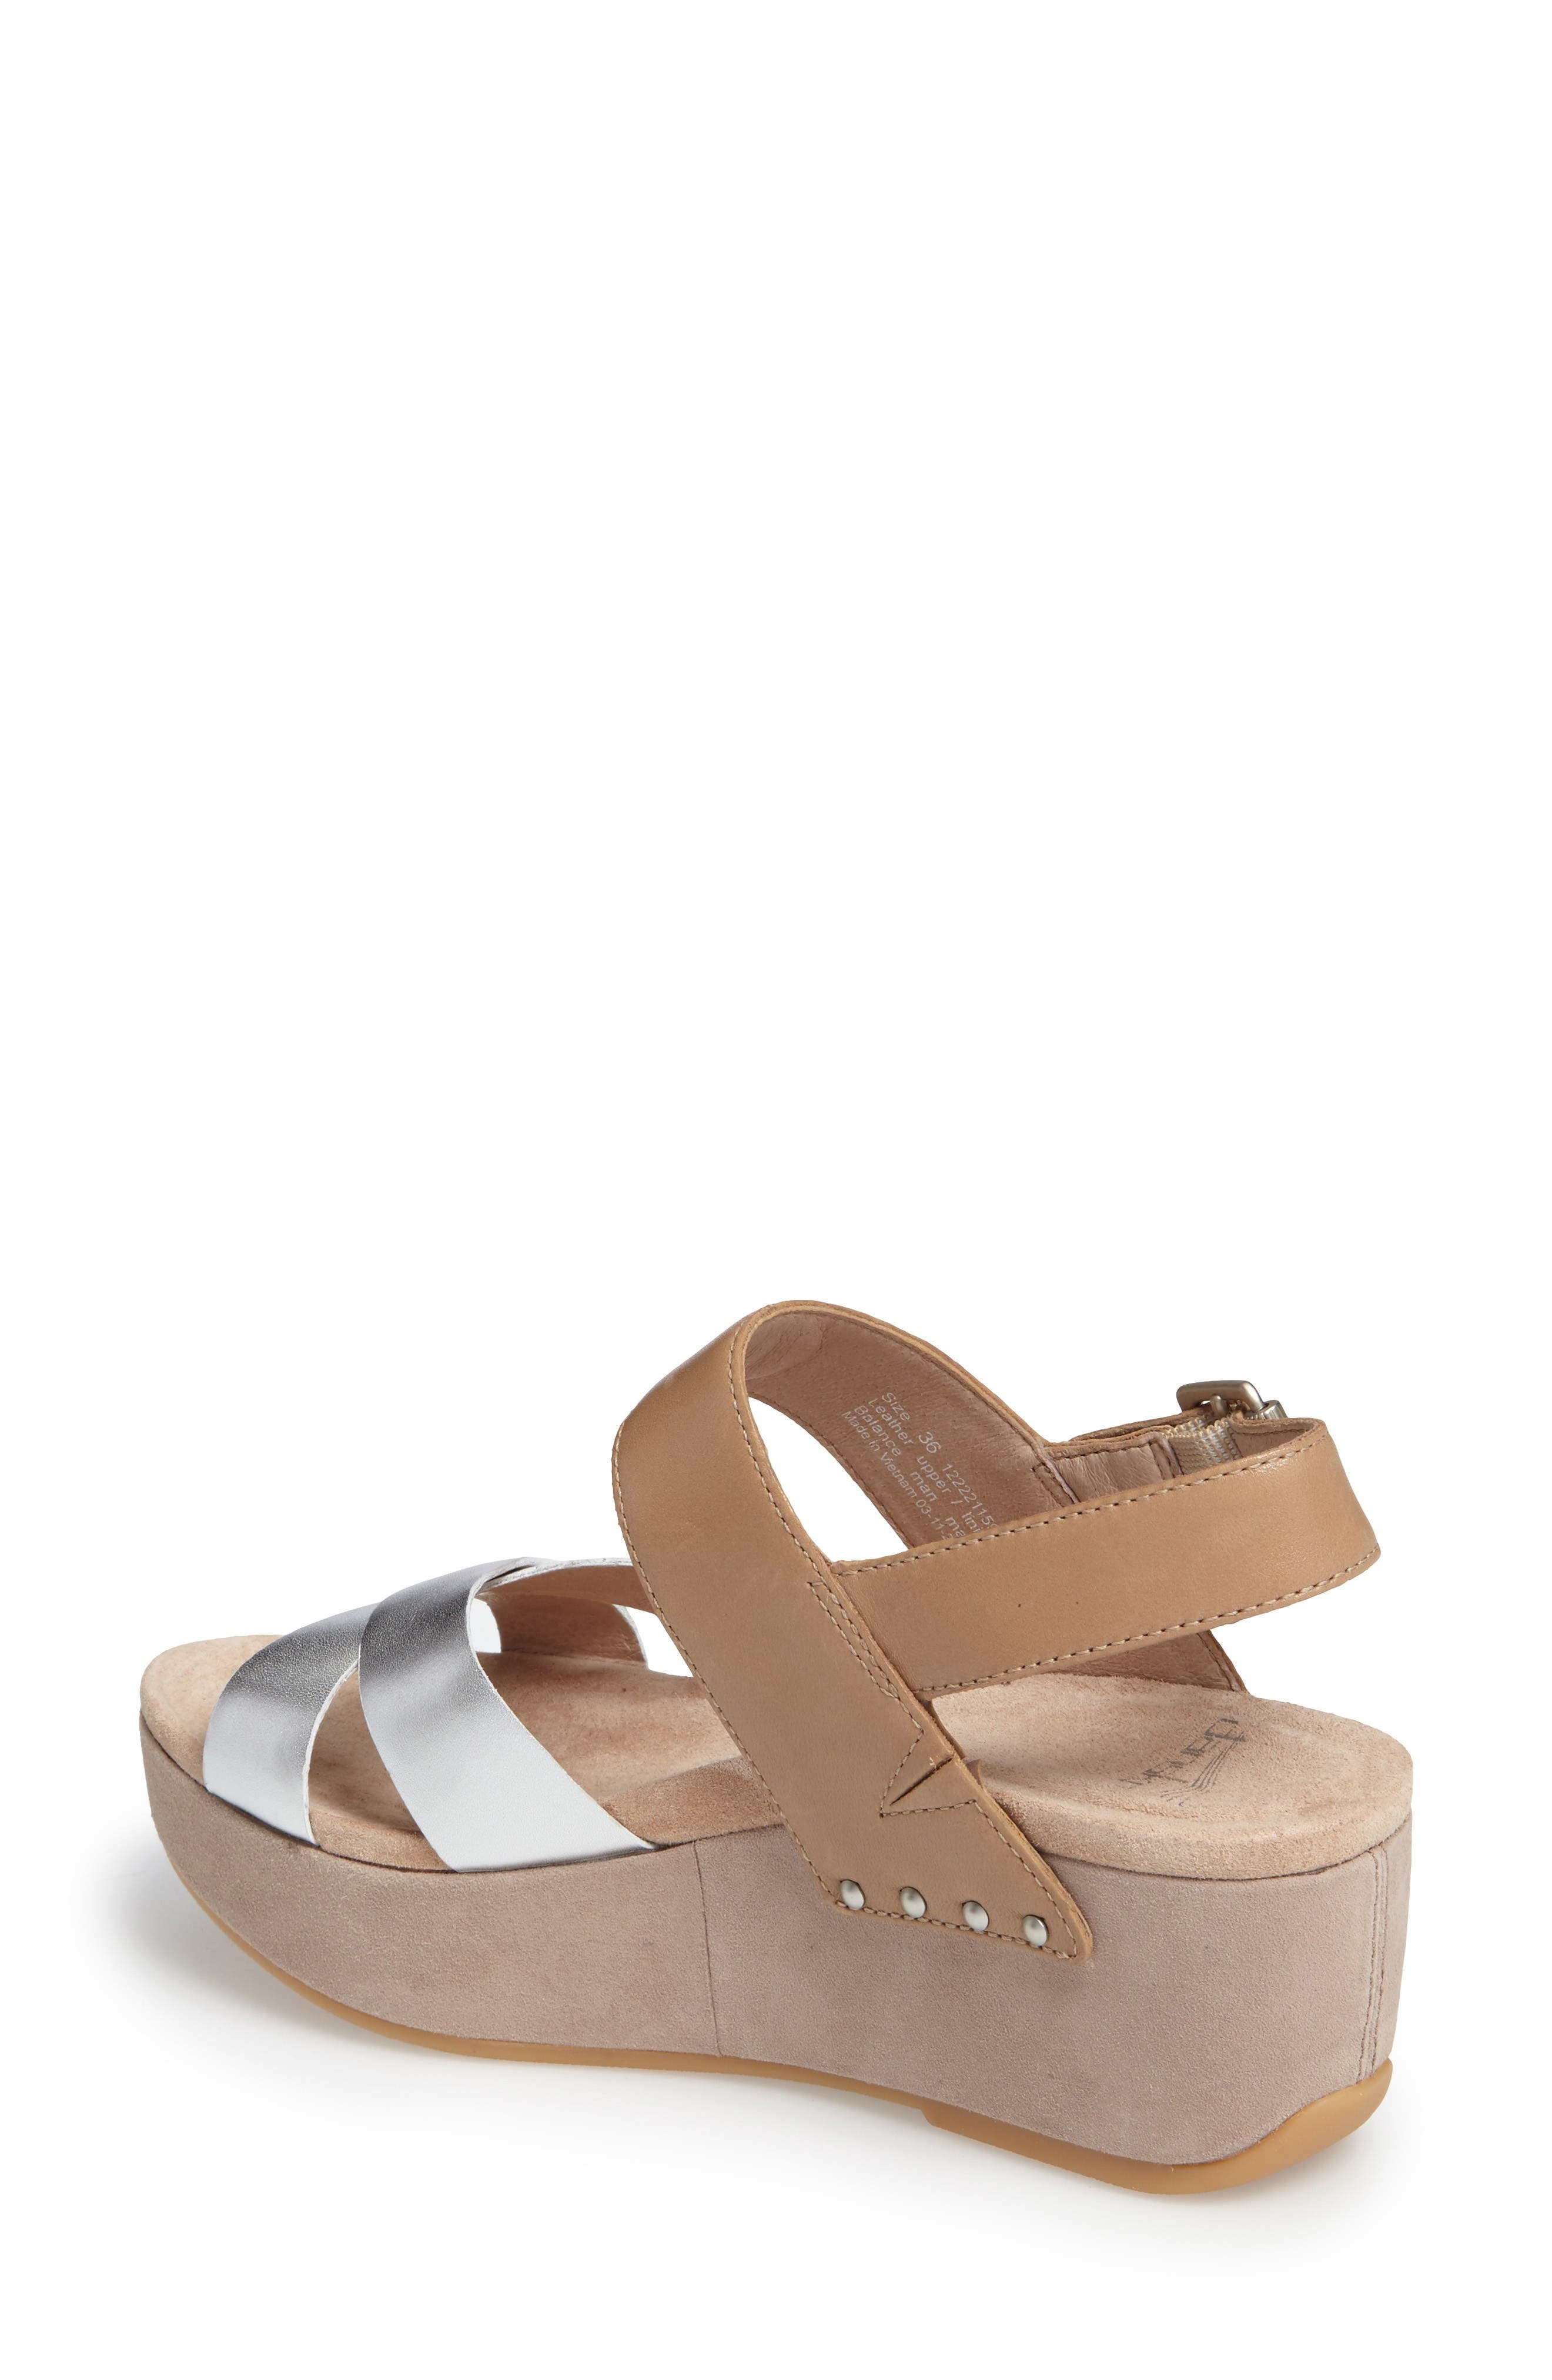 Stasia Platform Wedge Sandal,                             Alternate thumbnail 2, color,                             Sand/ Silver Leather